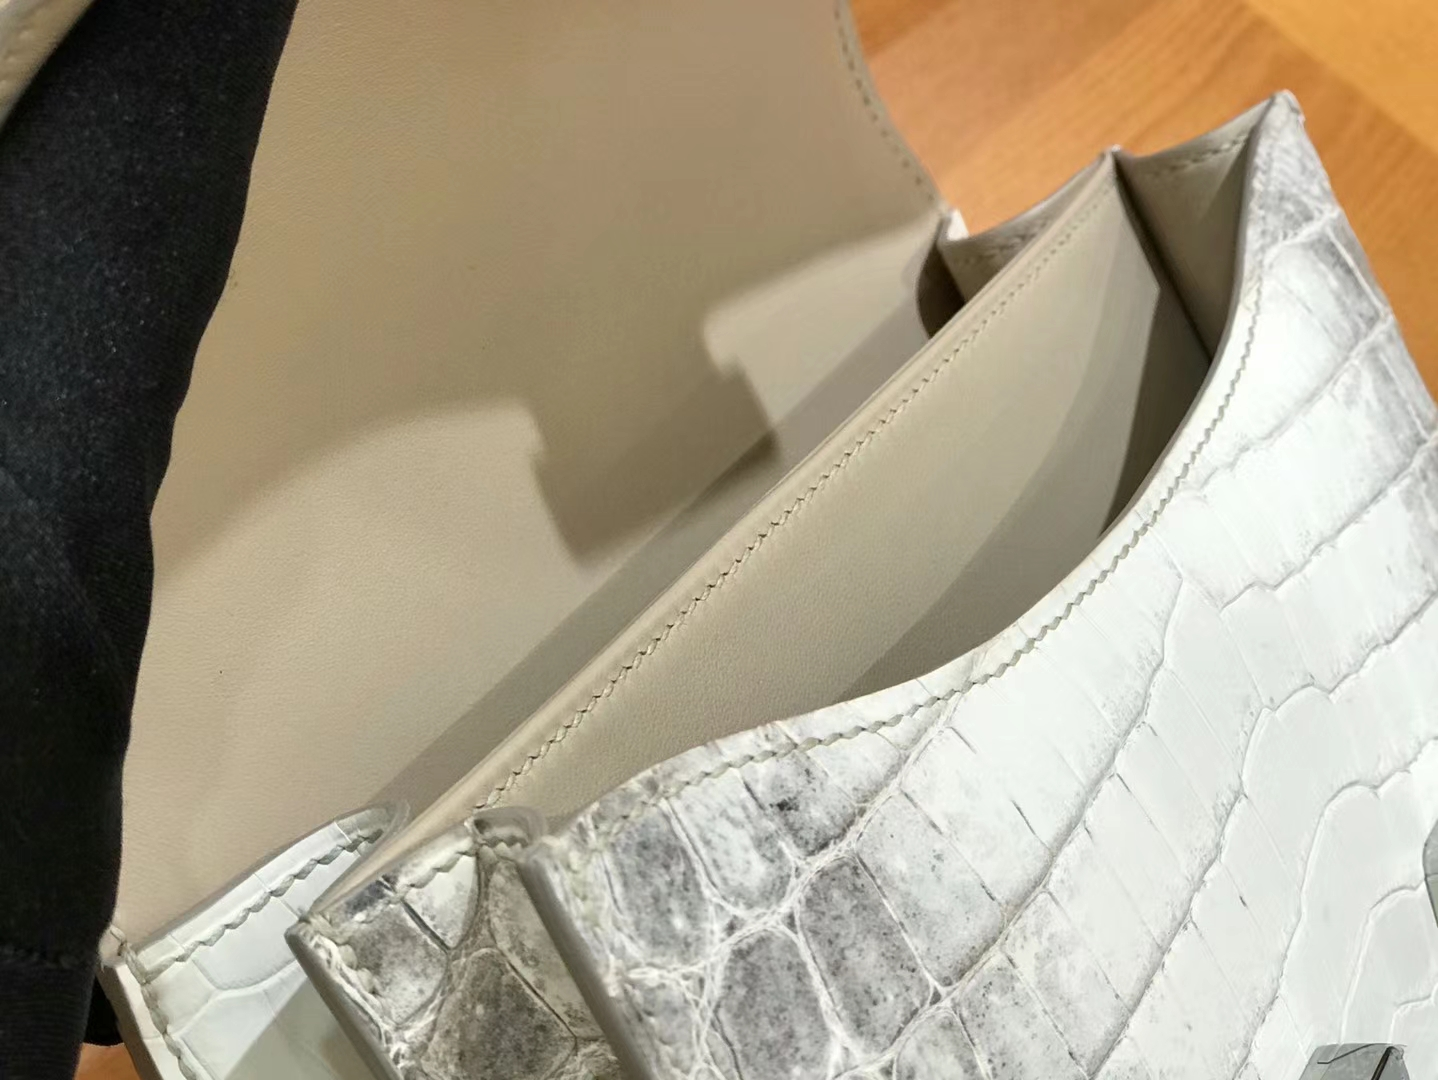 Hermès(爱马仕)Constance 空姐包 喜玛拉雅 银扣 18cm 顶级品质